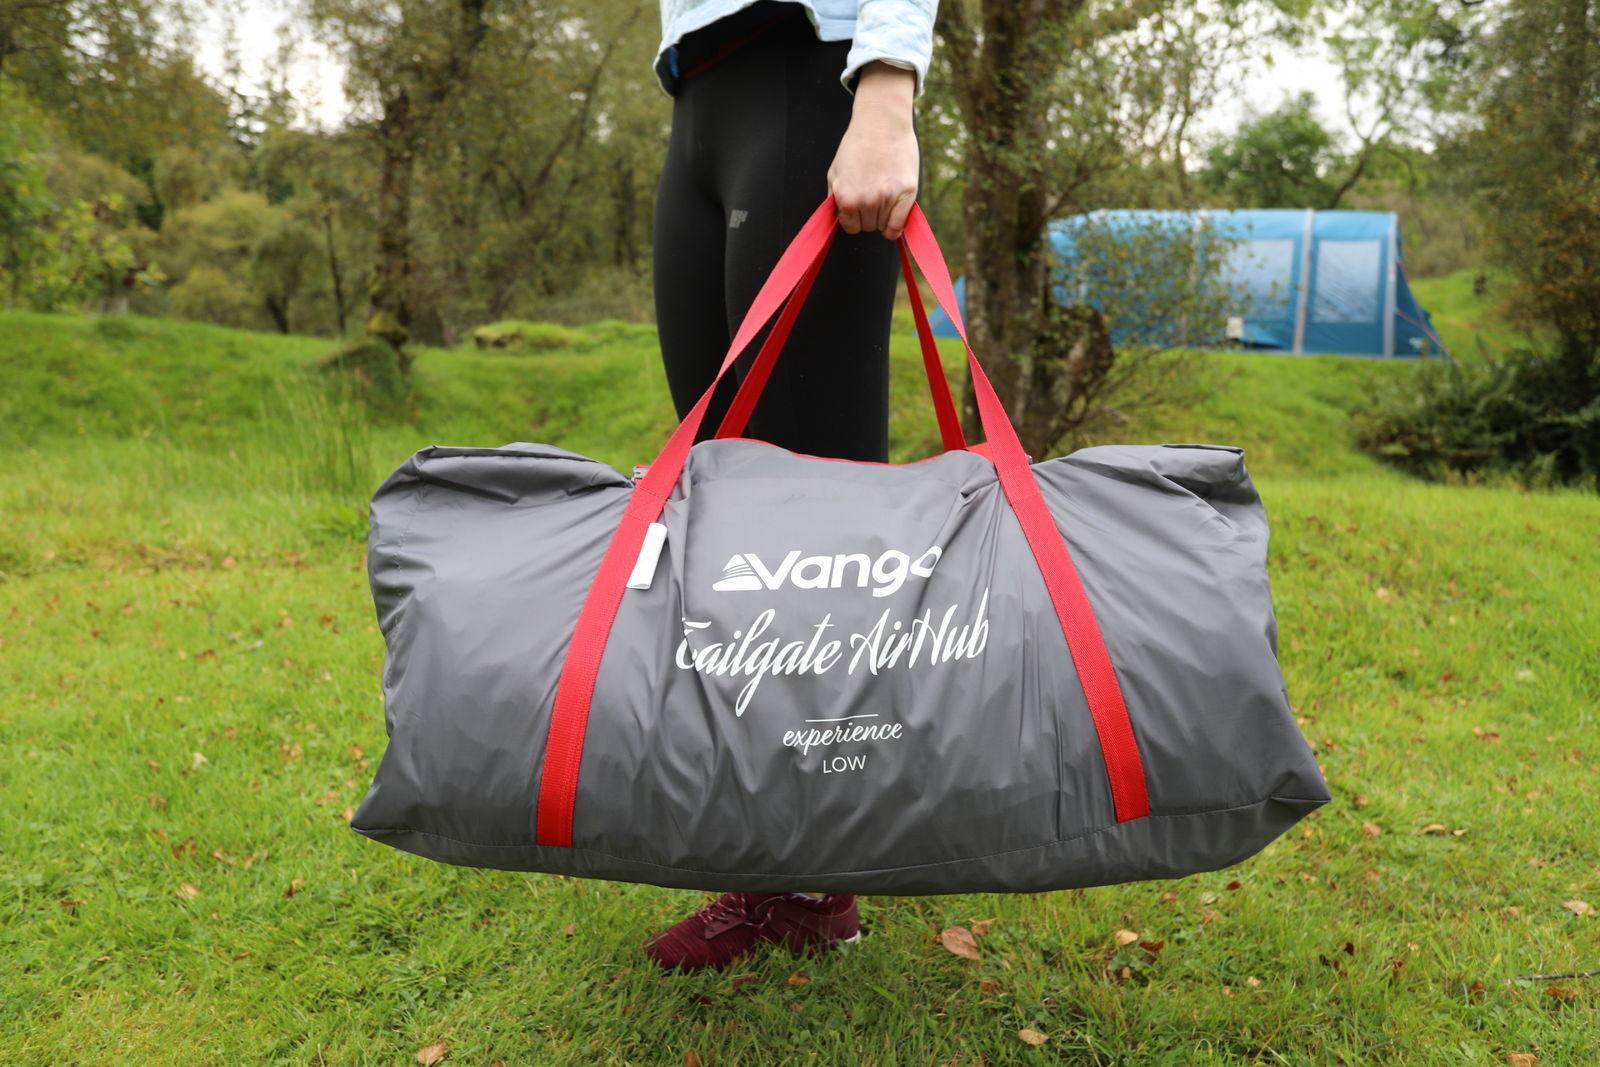 Vango Tailgate Airhub Low 2021 Norwich Camping 5